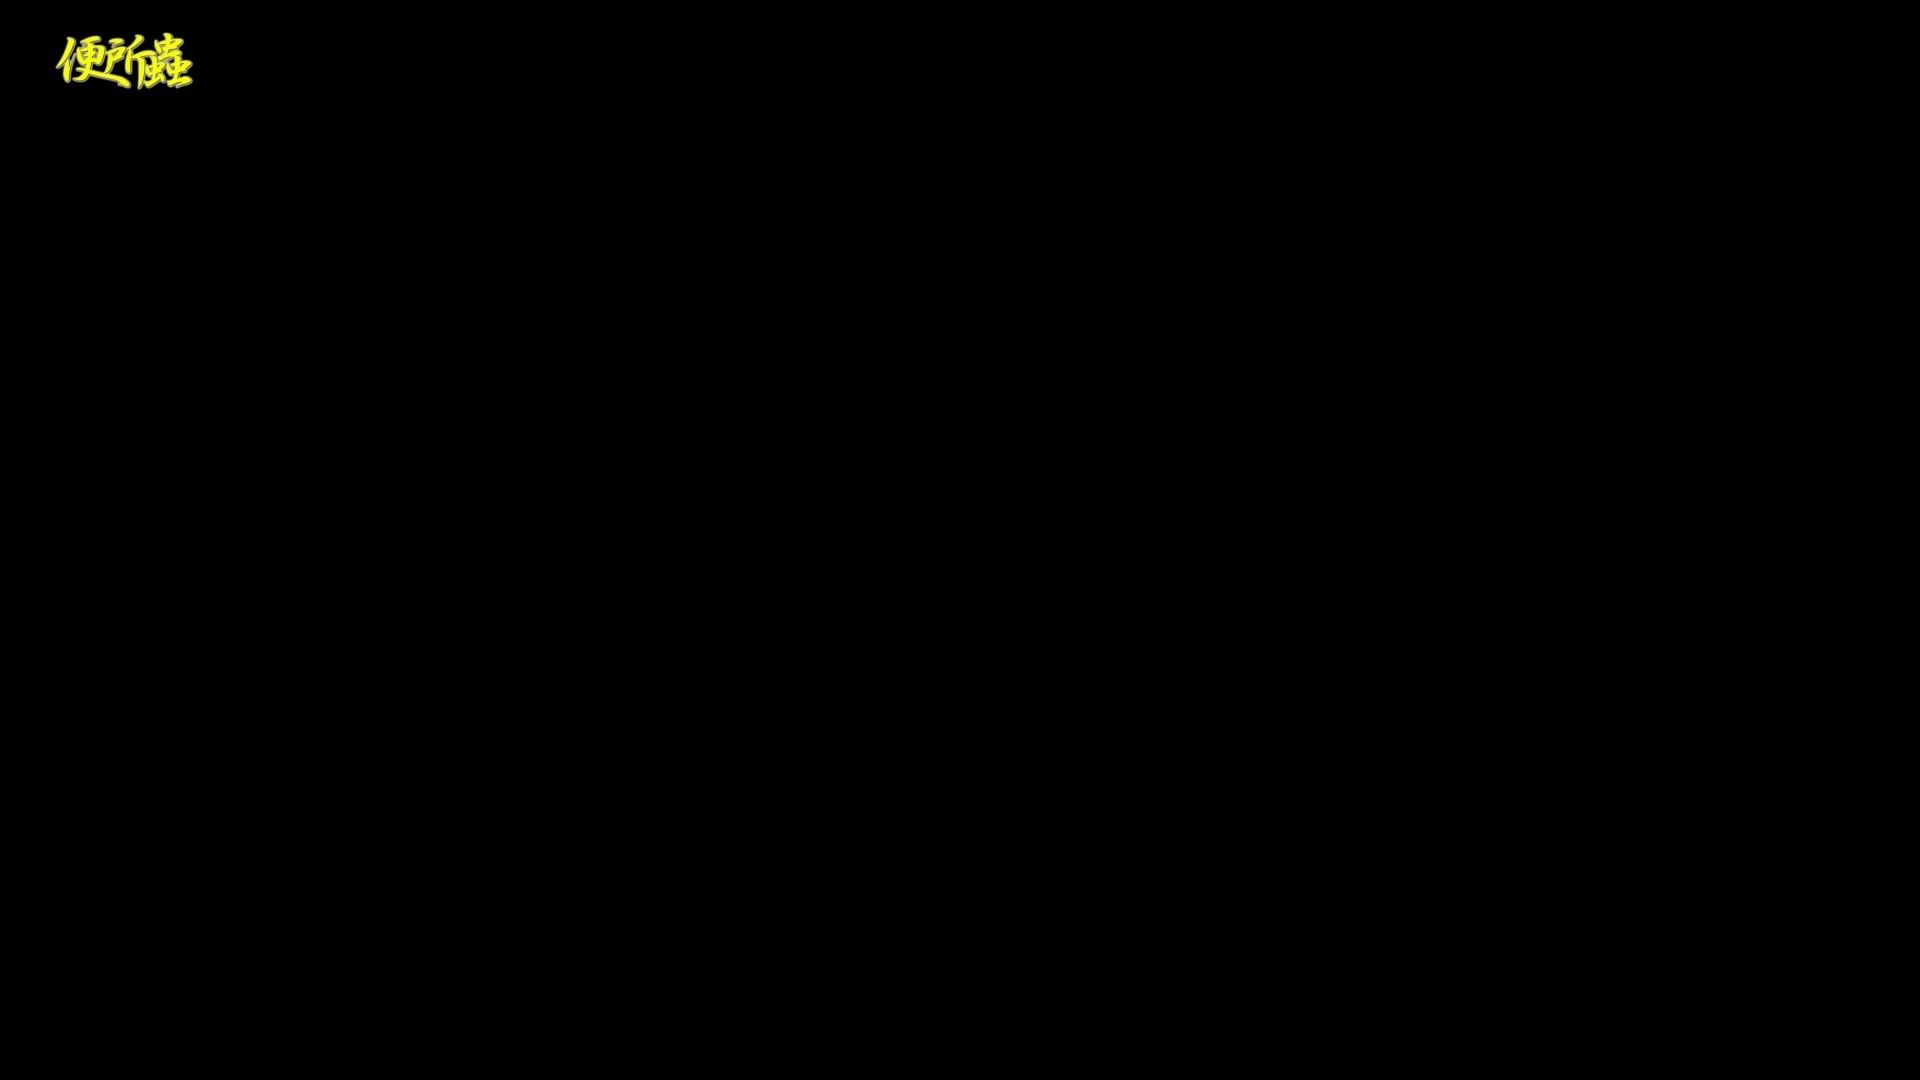 vol.08 便所蟲さんのリターン~寺子屋洗面所盗撮~ 盗撮  94PIX 61